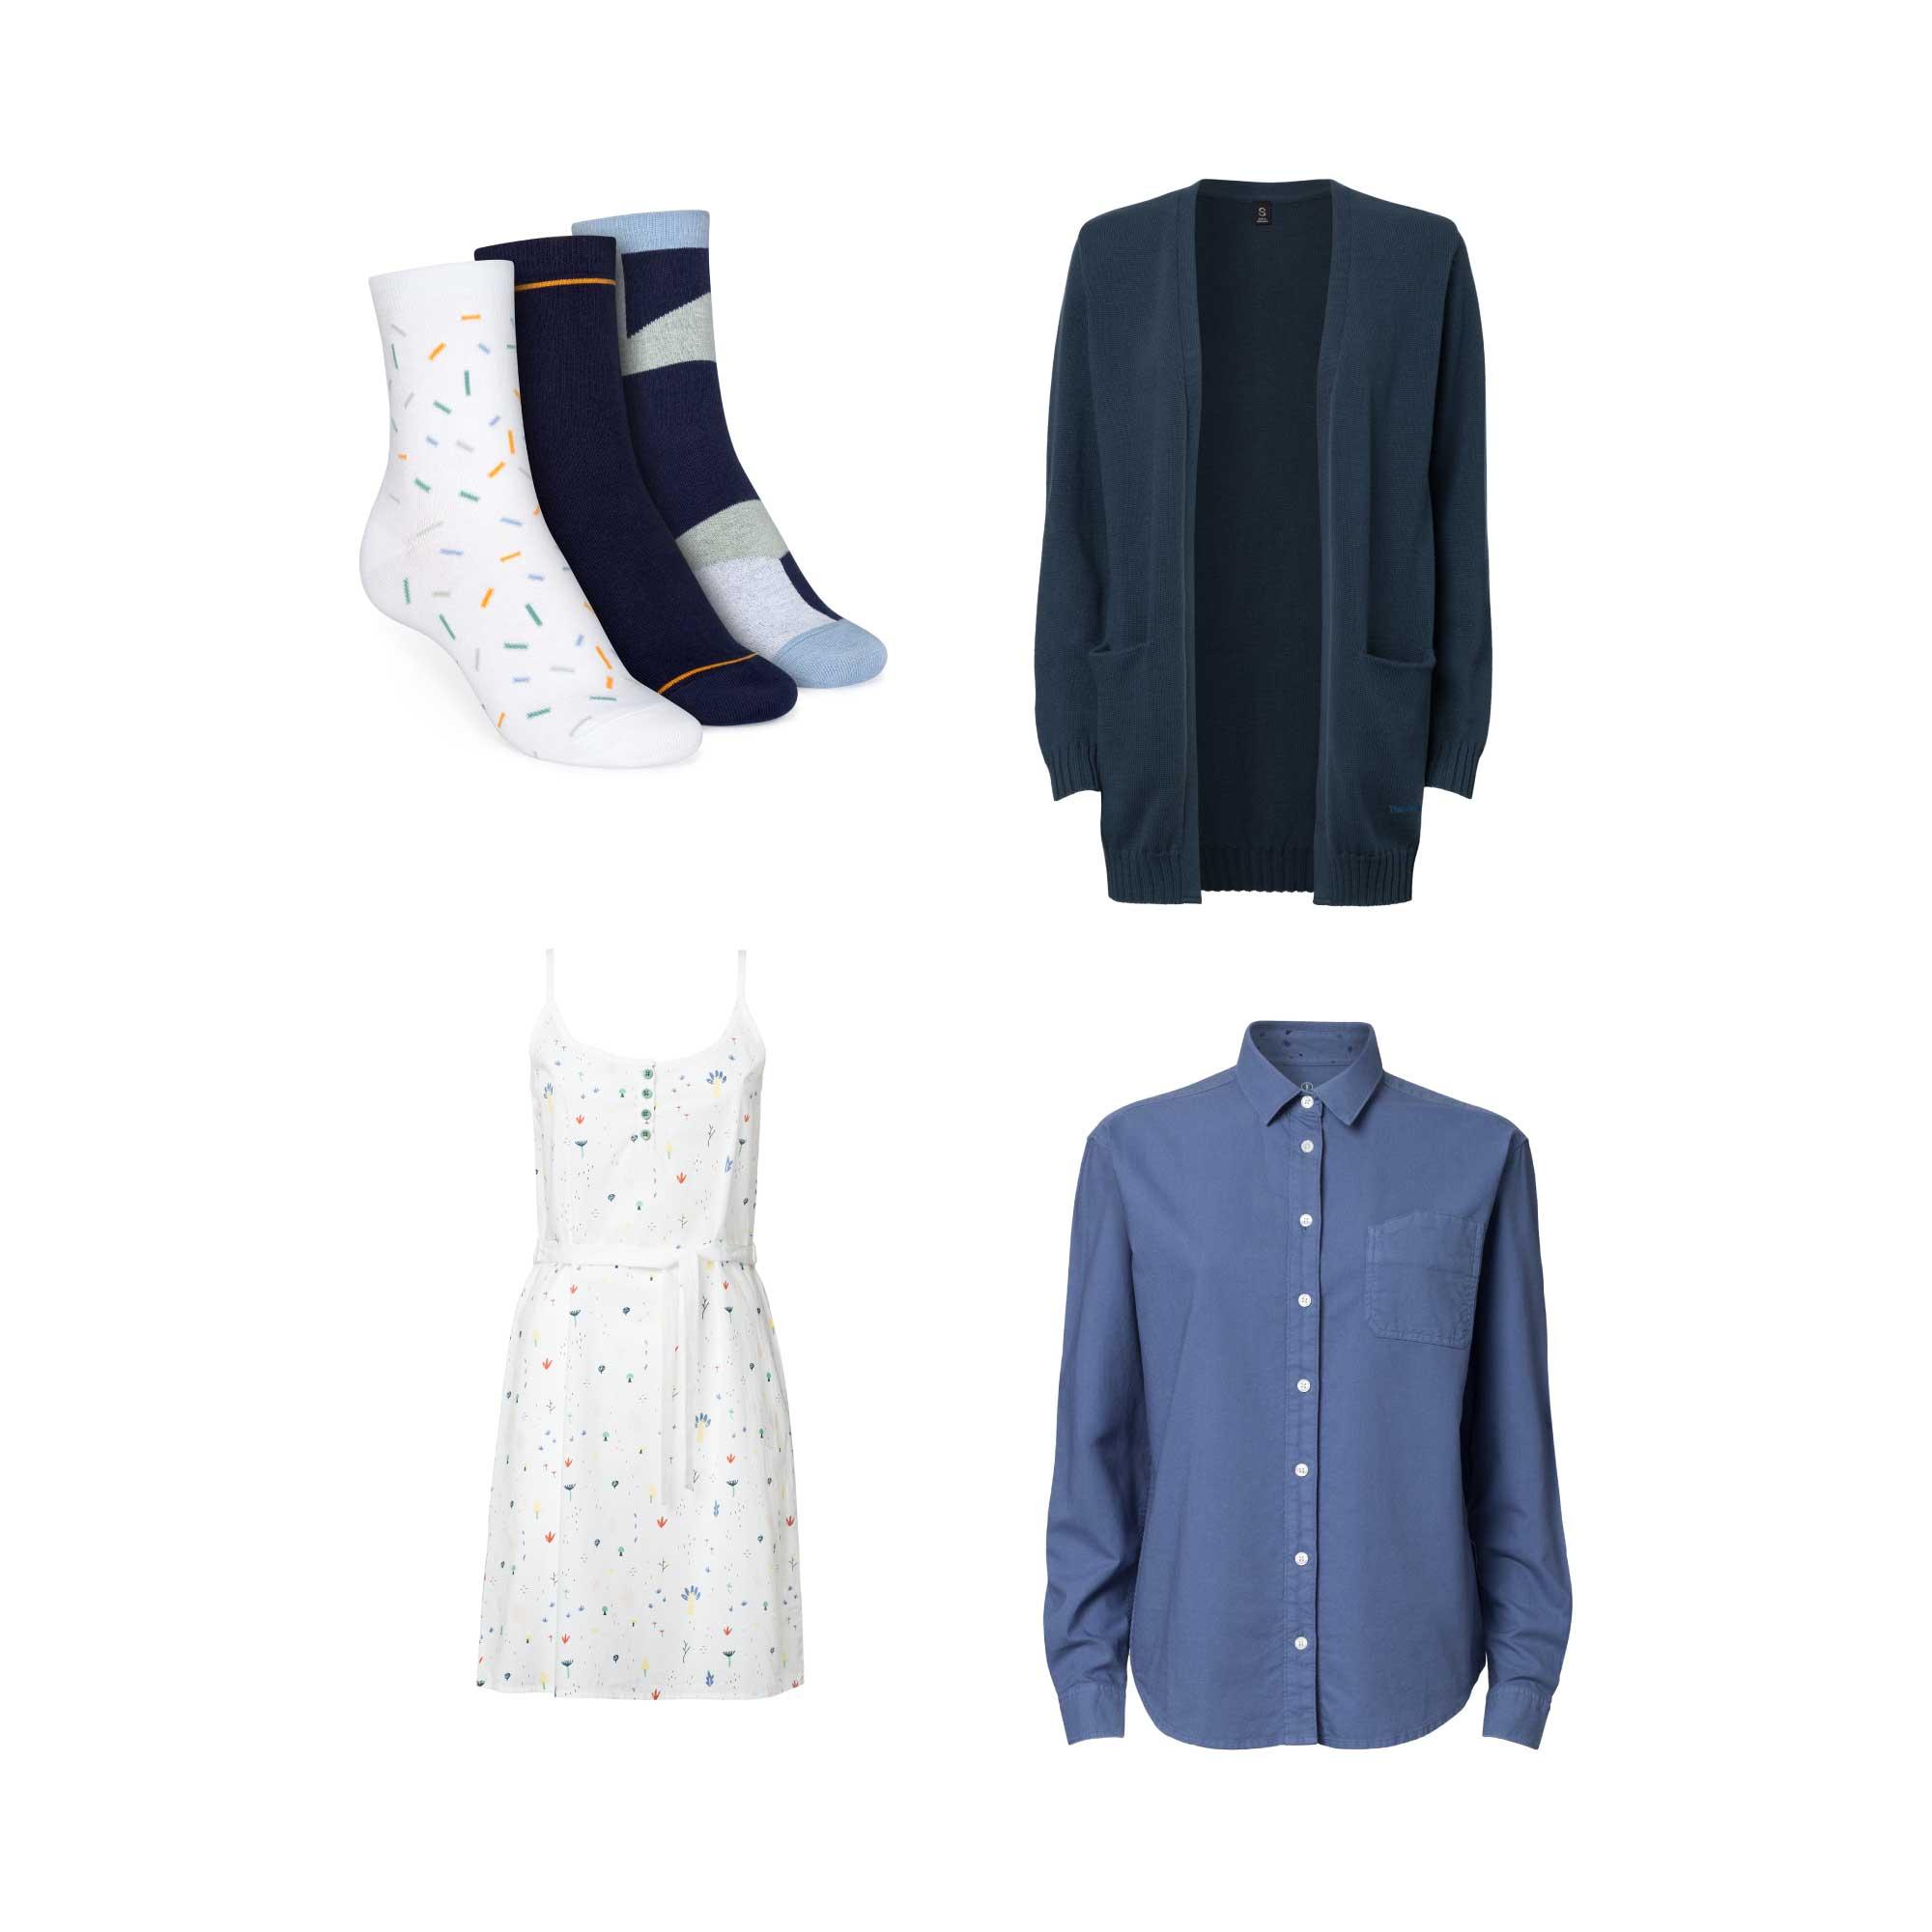 6er Pack Tiny Garden TT58 Dress | TT67 Shirt | TT3004 Cardigan | Mid-Top Socken